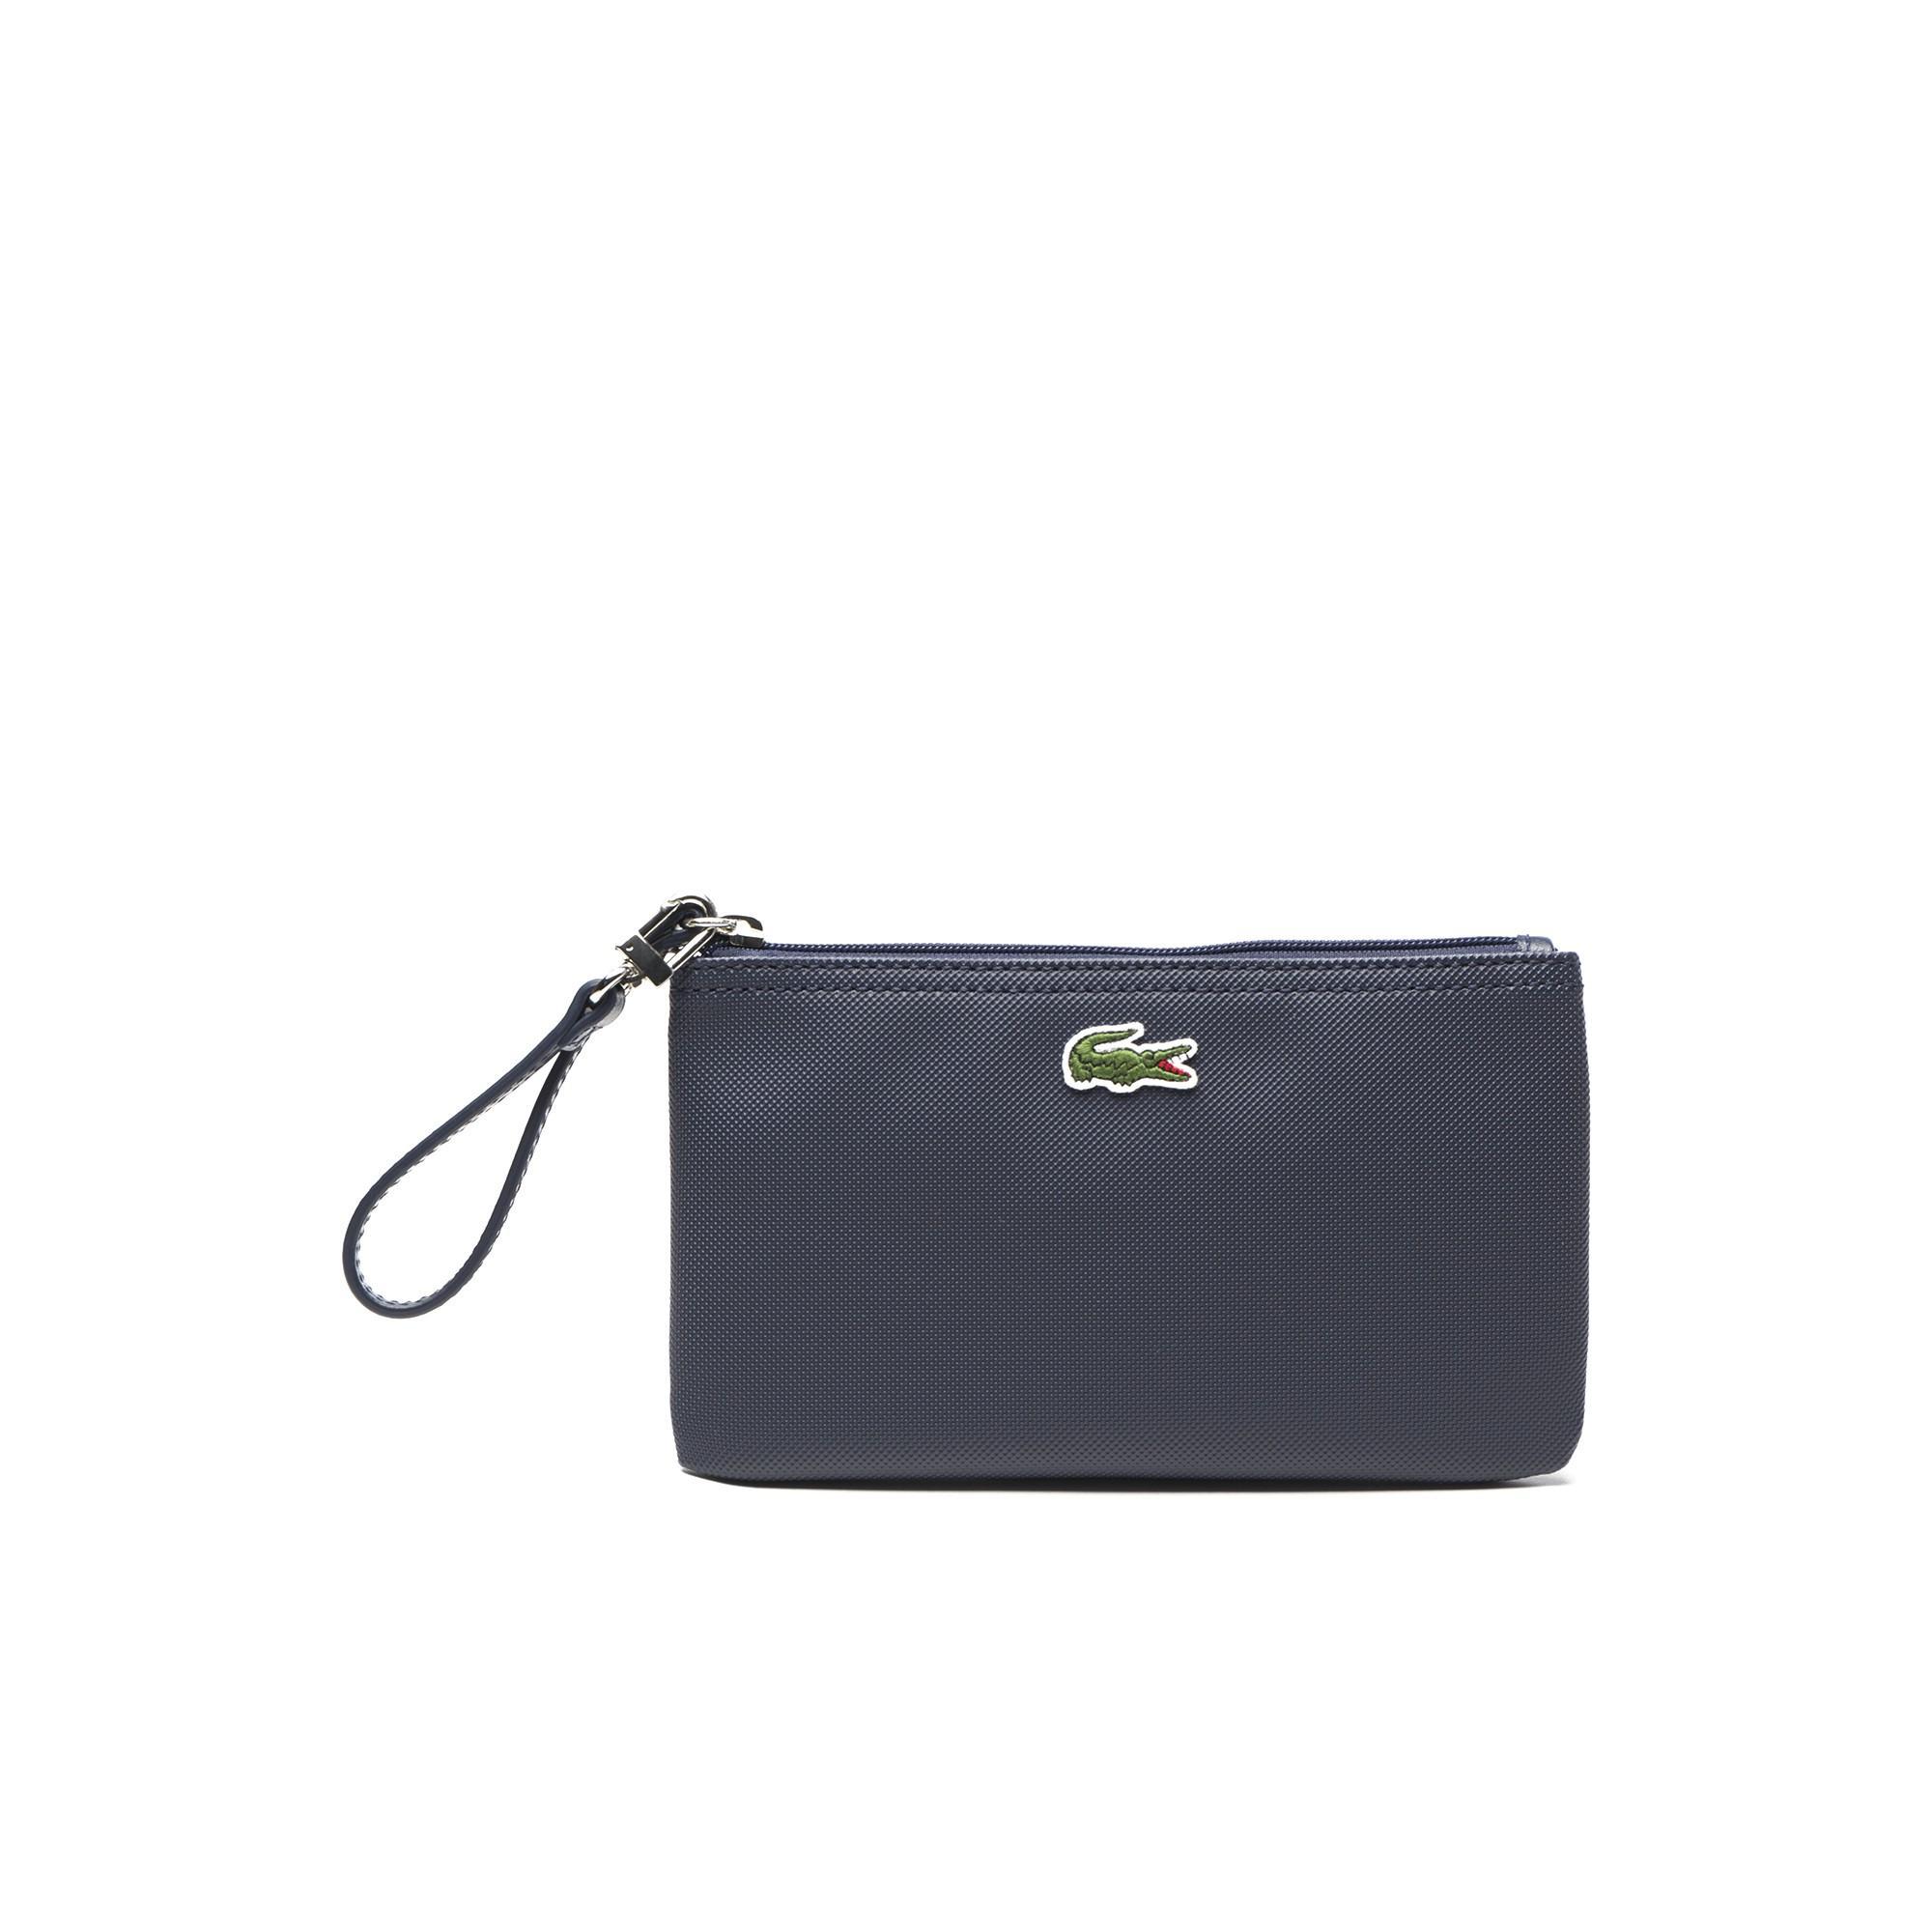 Lacoste Women's L.12.12 Concept Zip Clutch Bag In Eclipse